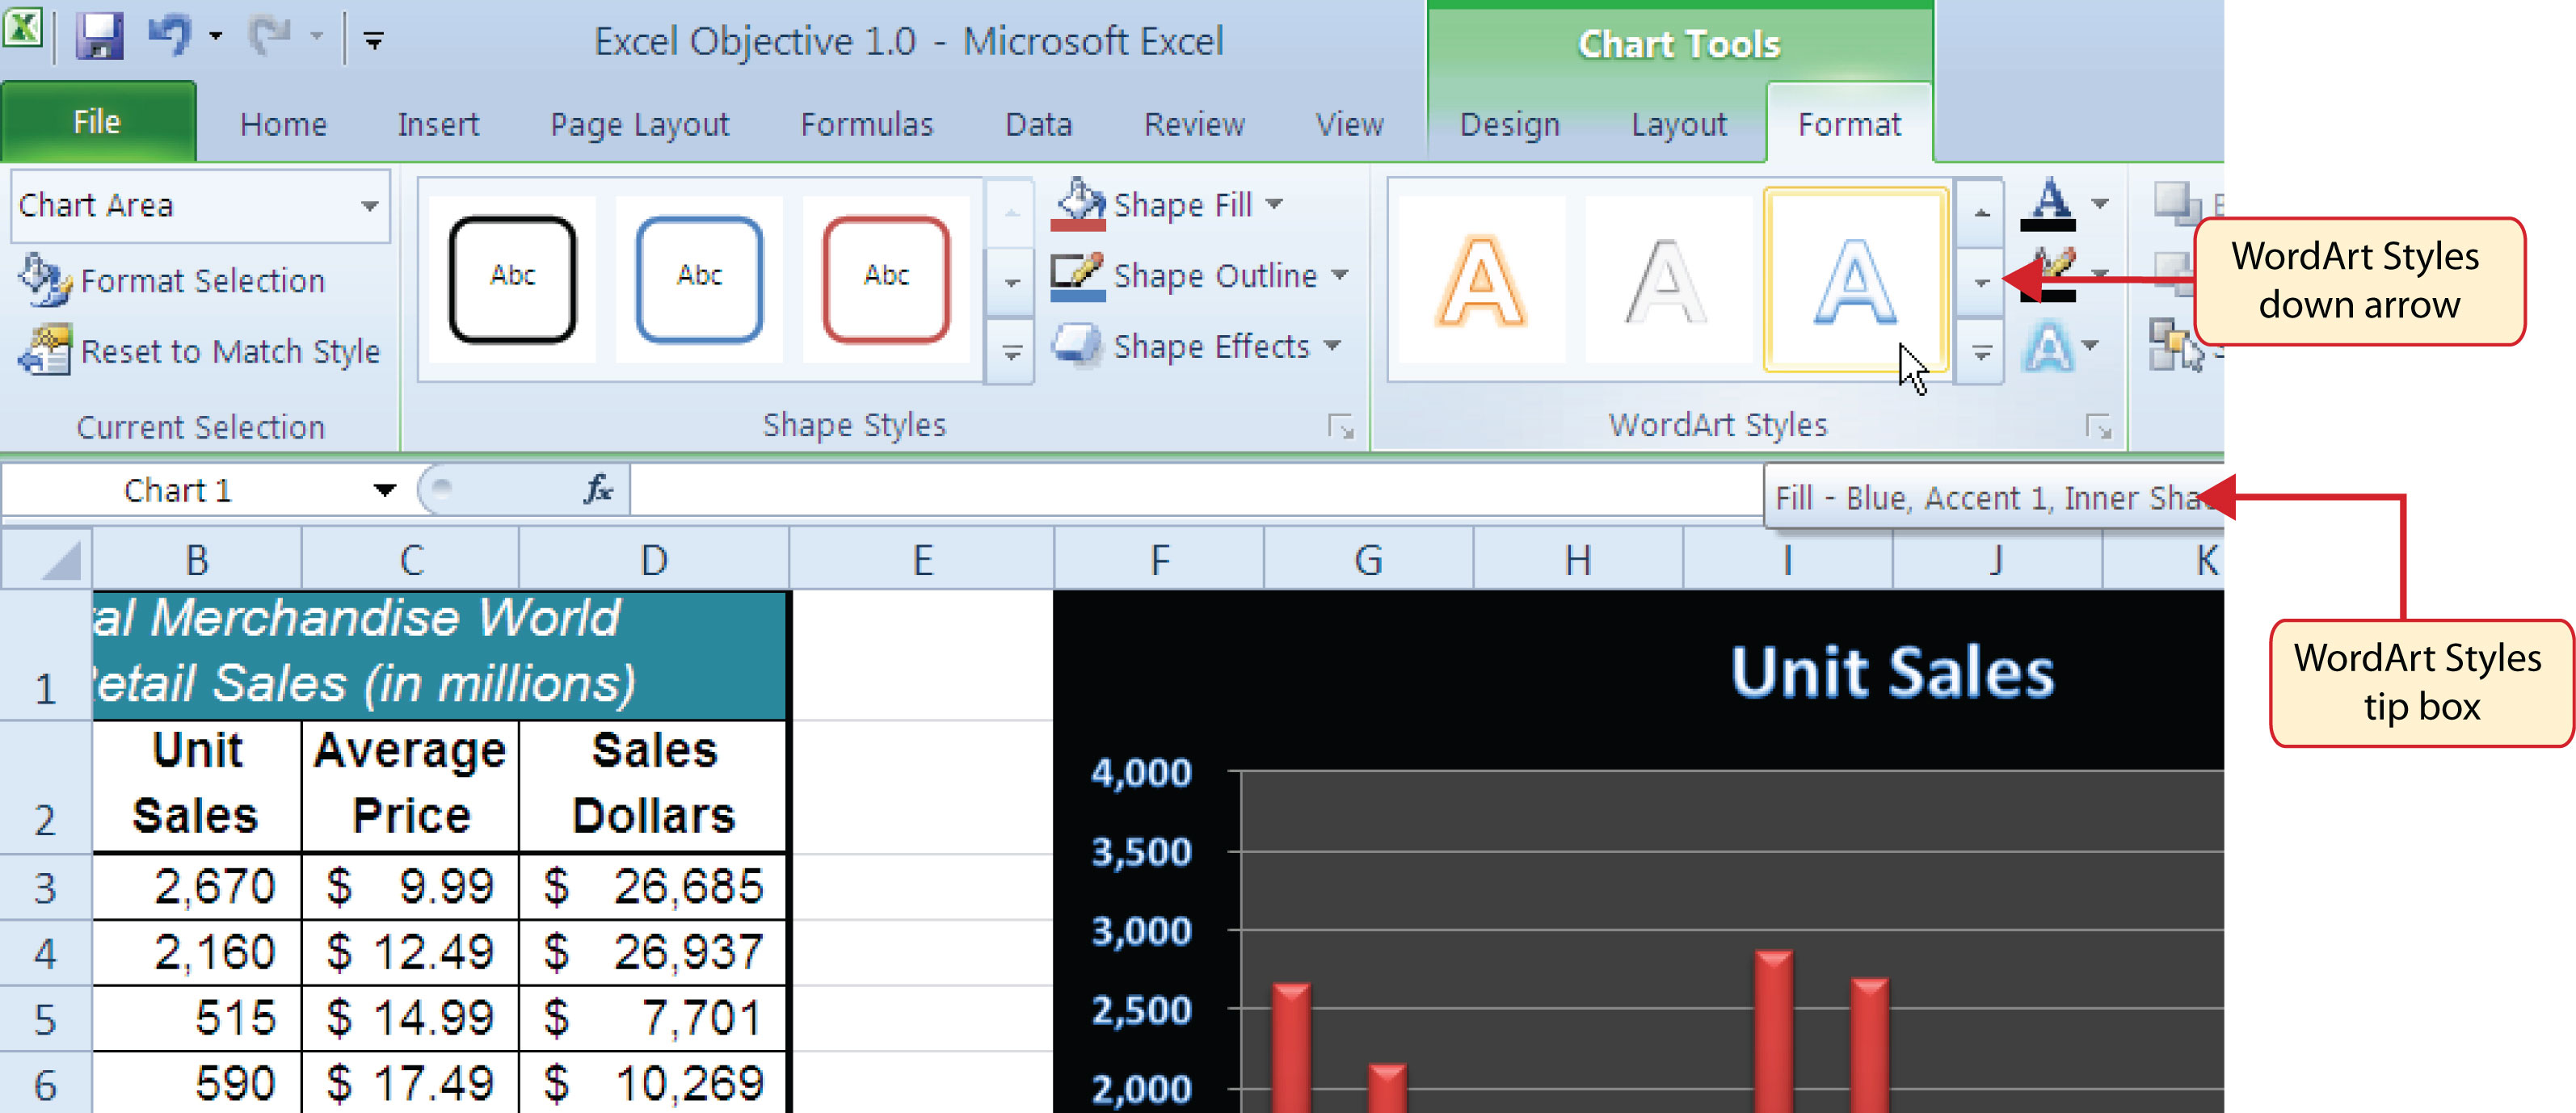 Formatting and Data Analysis